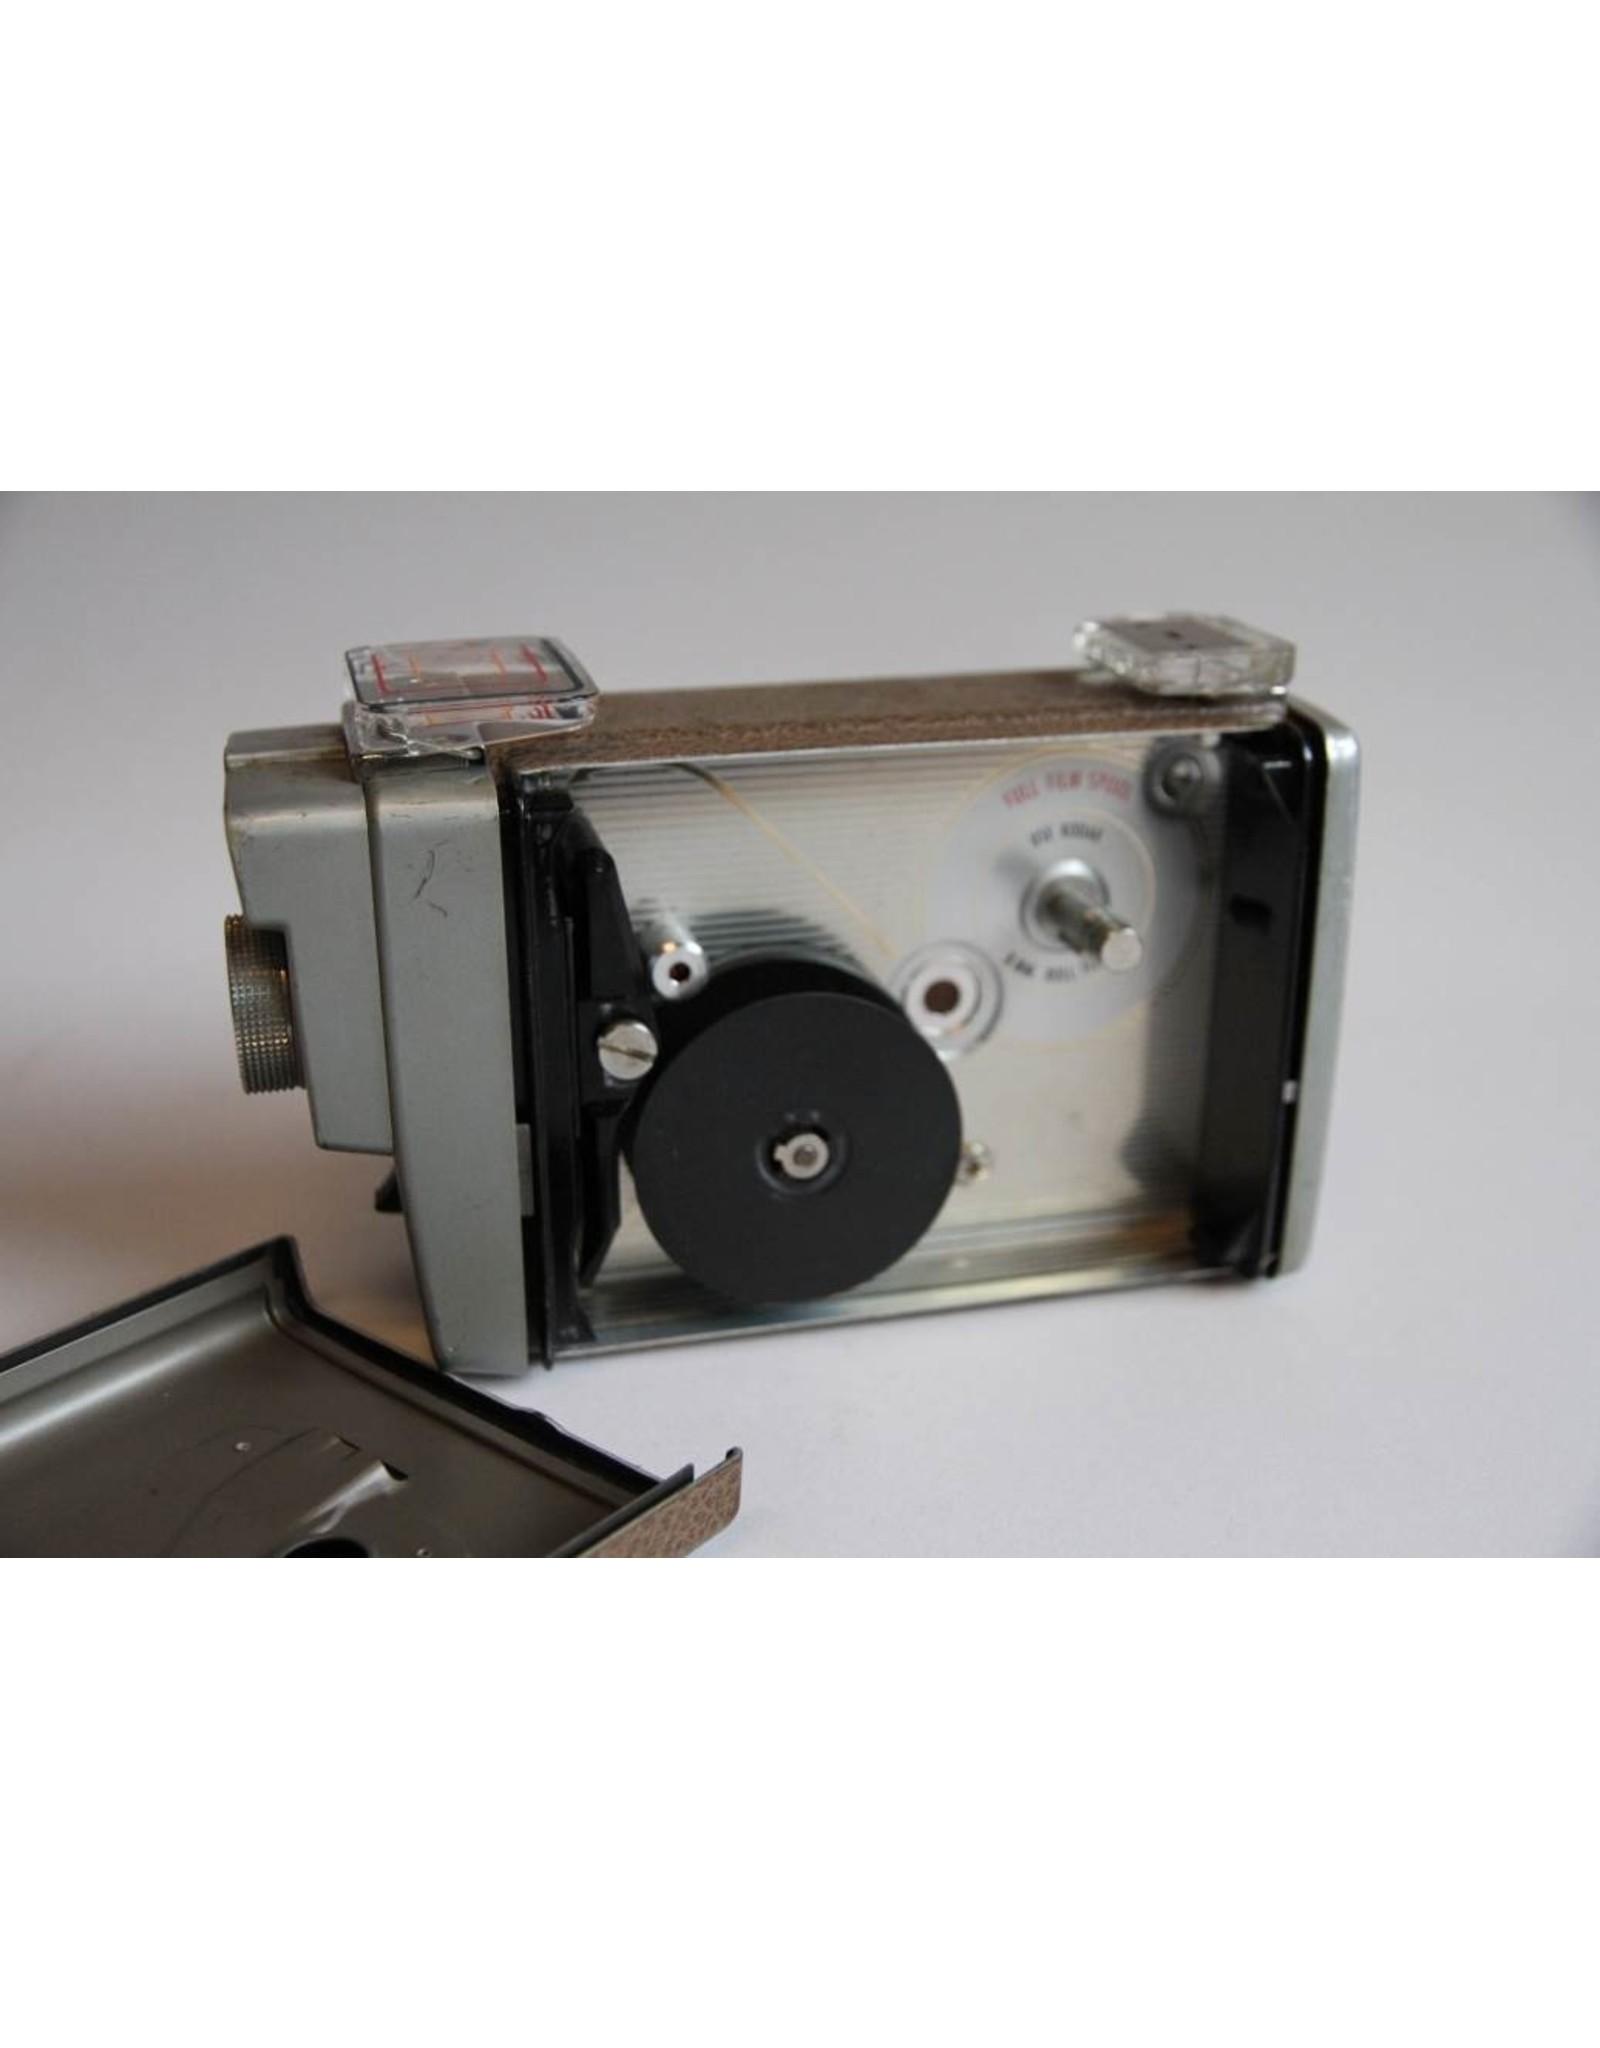 Camera - Brownie Movie Automatic 8mm F. 2.3 works